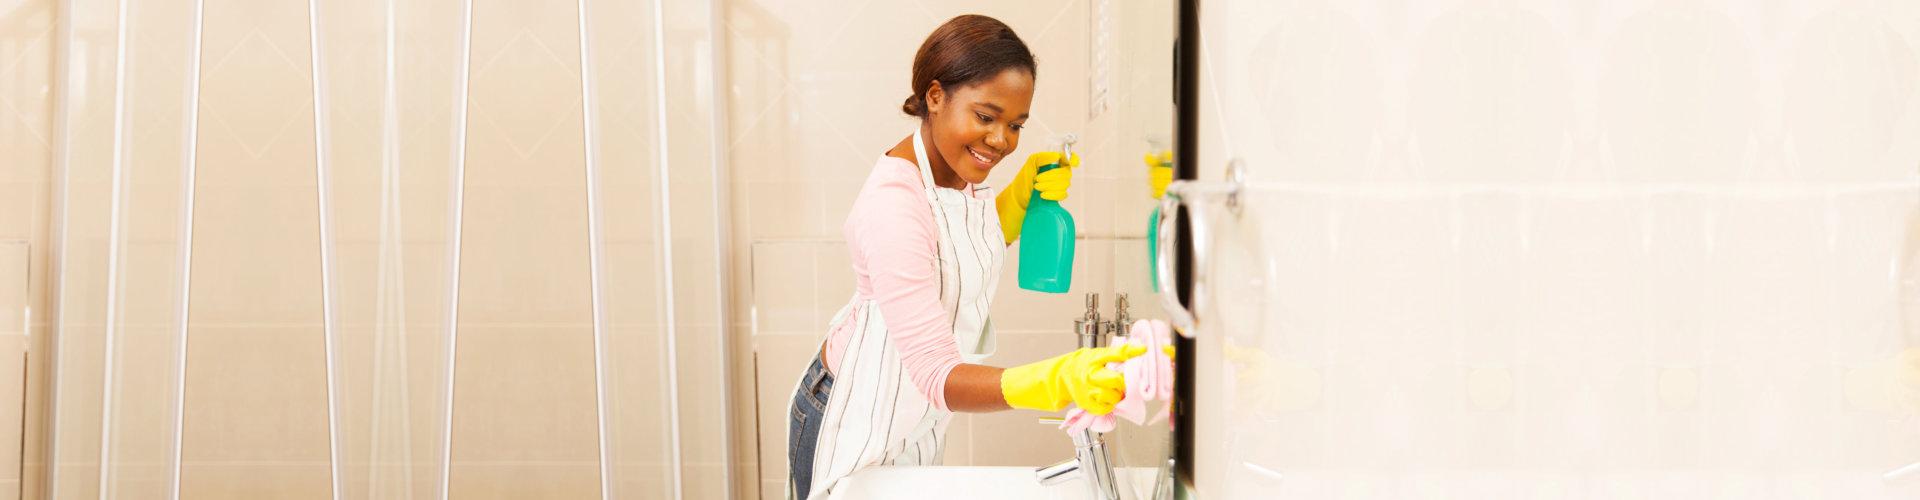 Woman cleaning bathroom mirror.